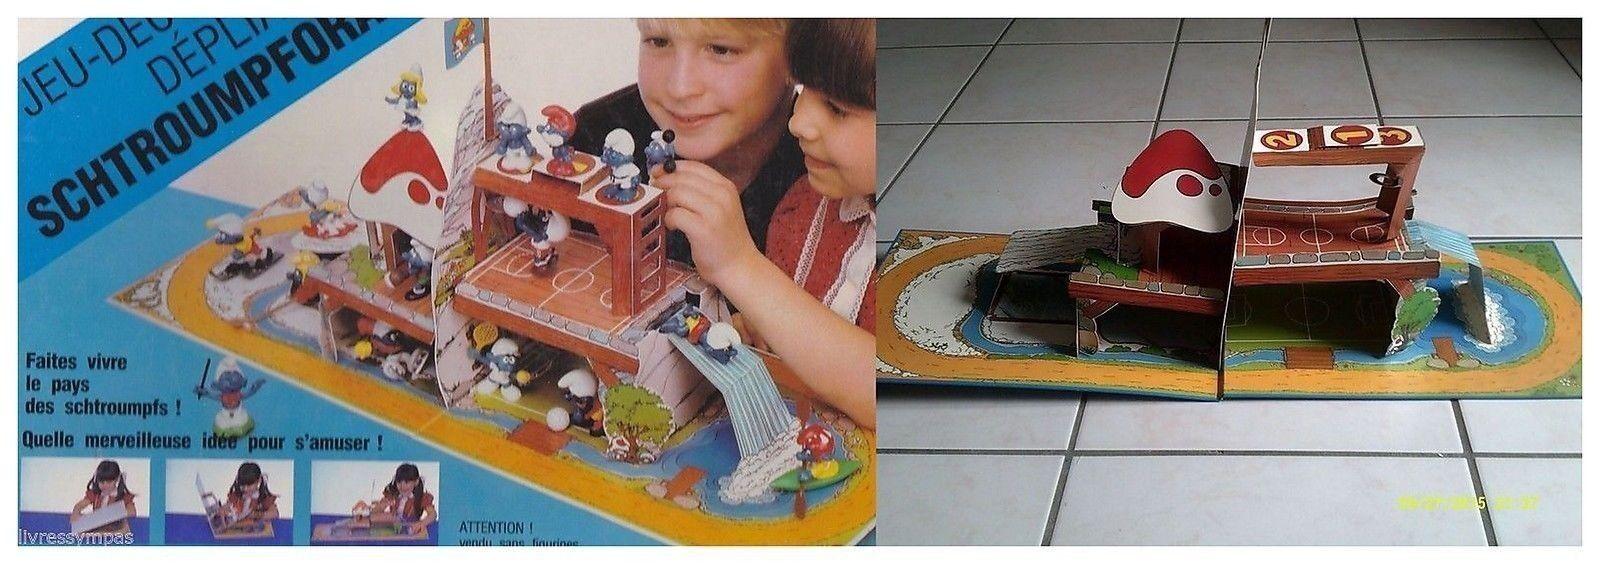 JEU DéCOR POP UP SCHTROUMPFORAMA - STADE - Peyo 1983-  Smurf - Schleich